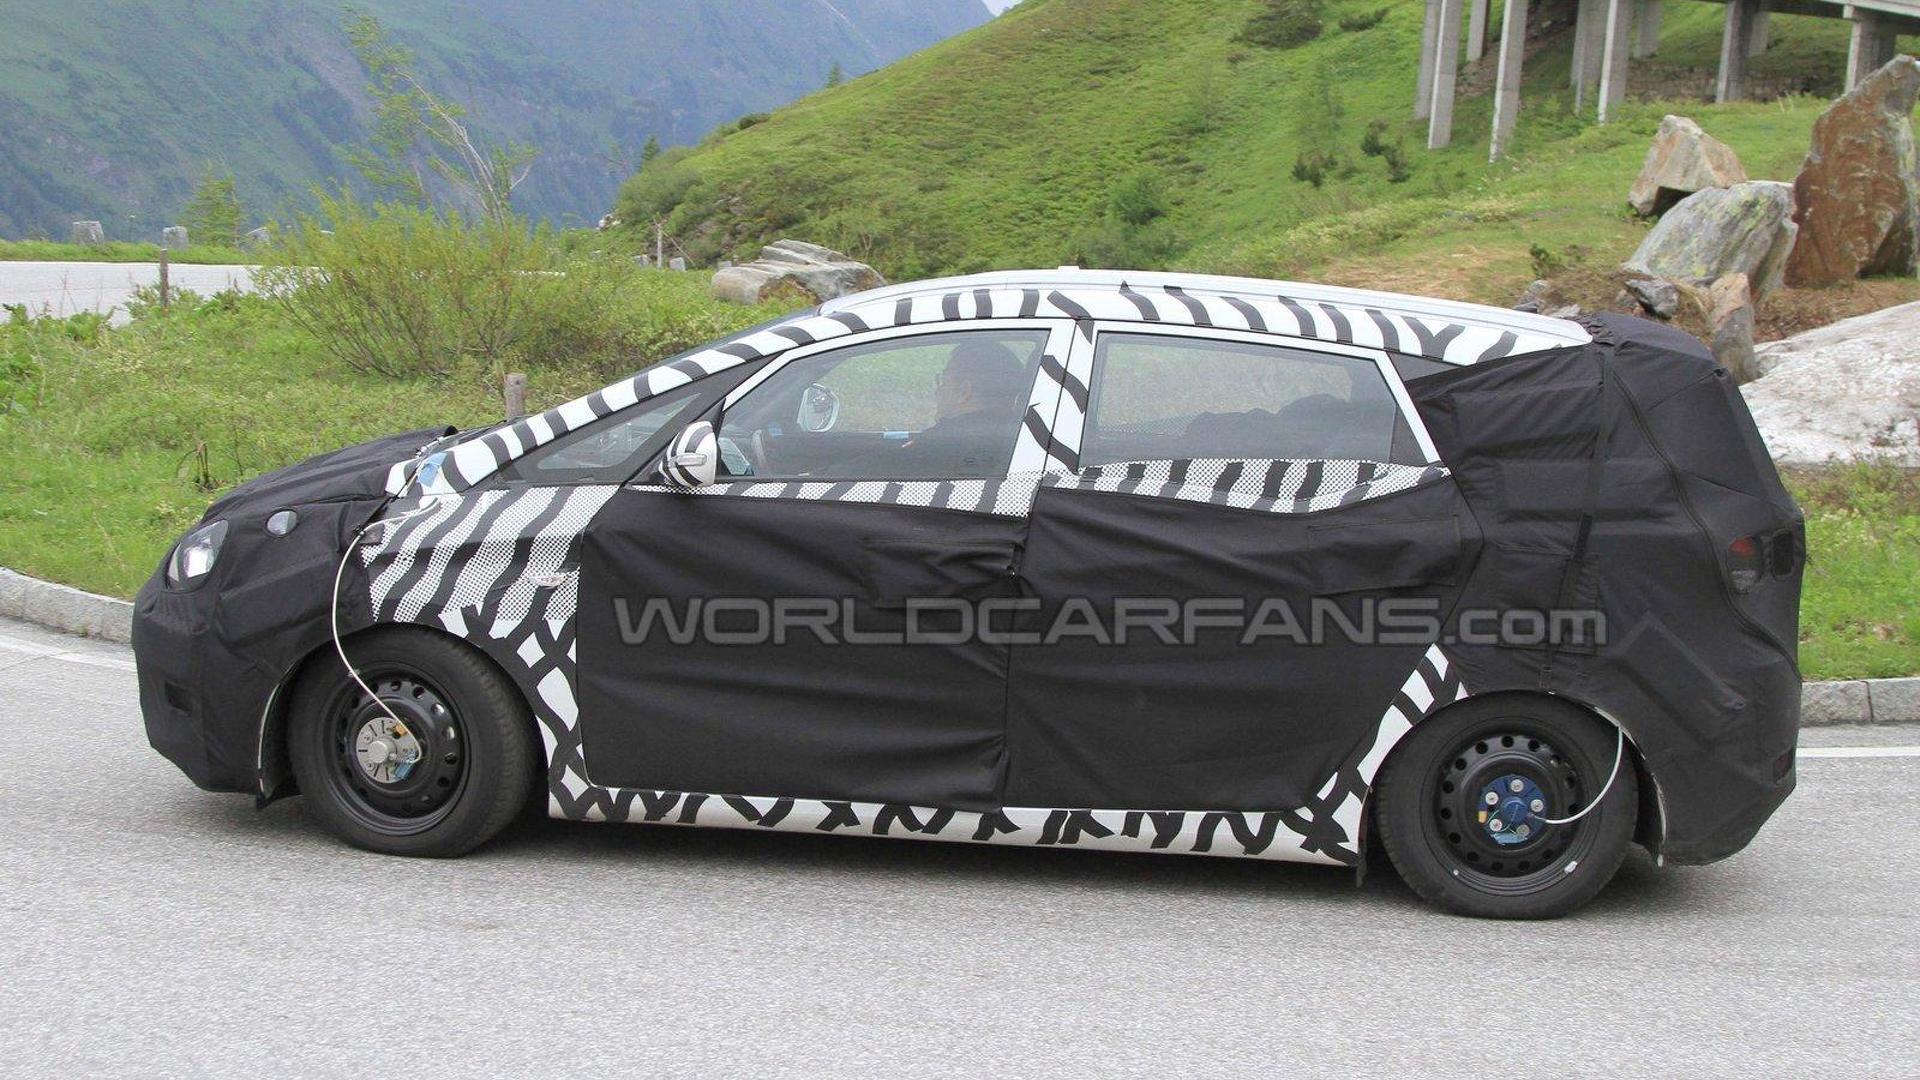 Hyundai i30 based MPV spied in Alps